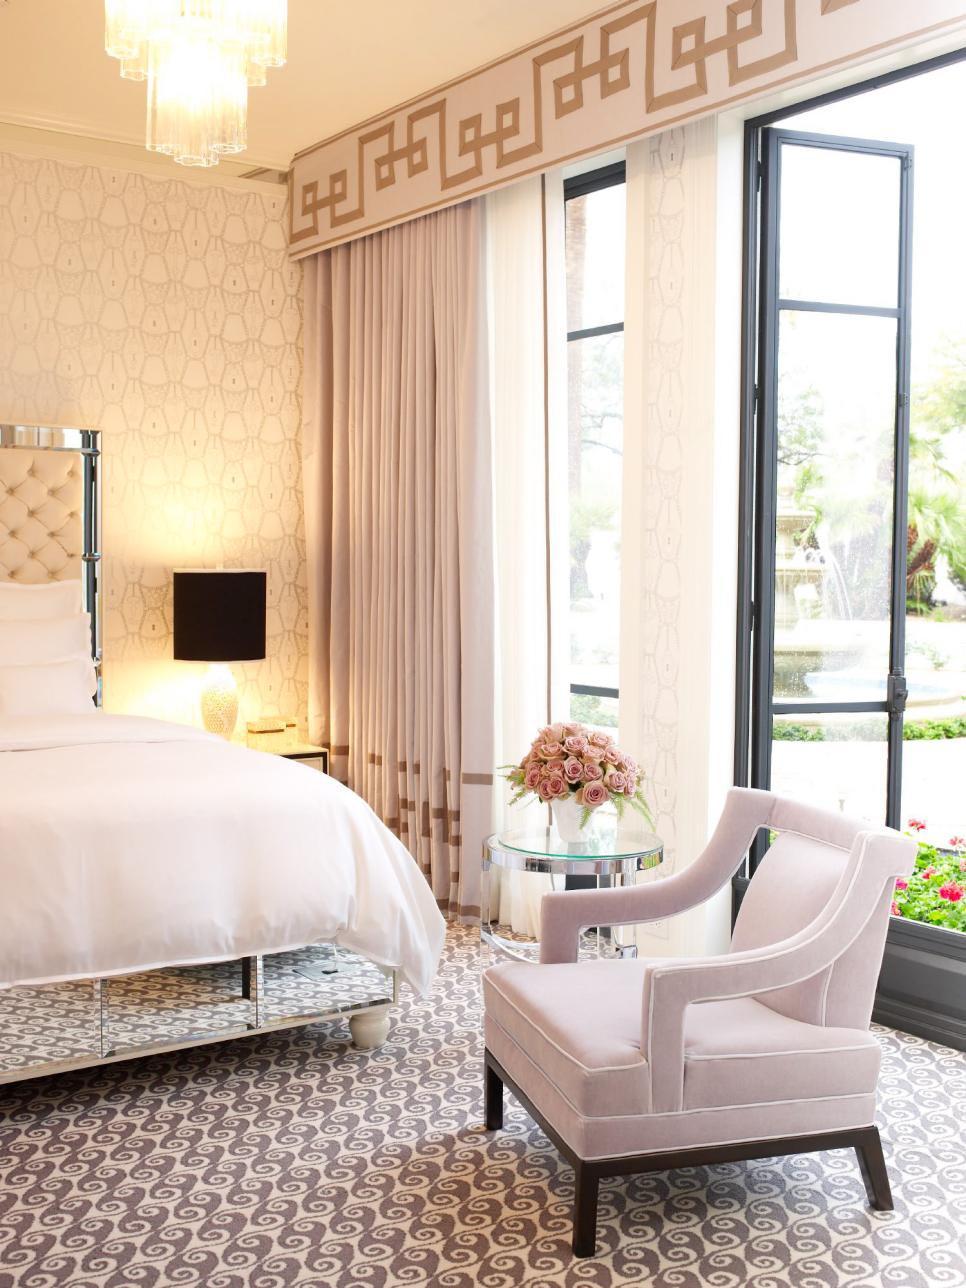 Window Valances for Bedroom